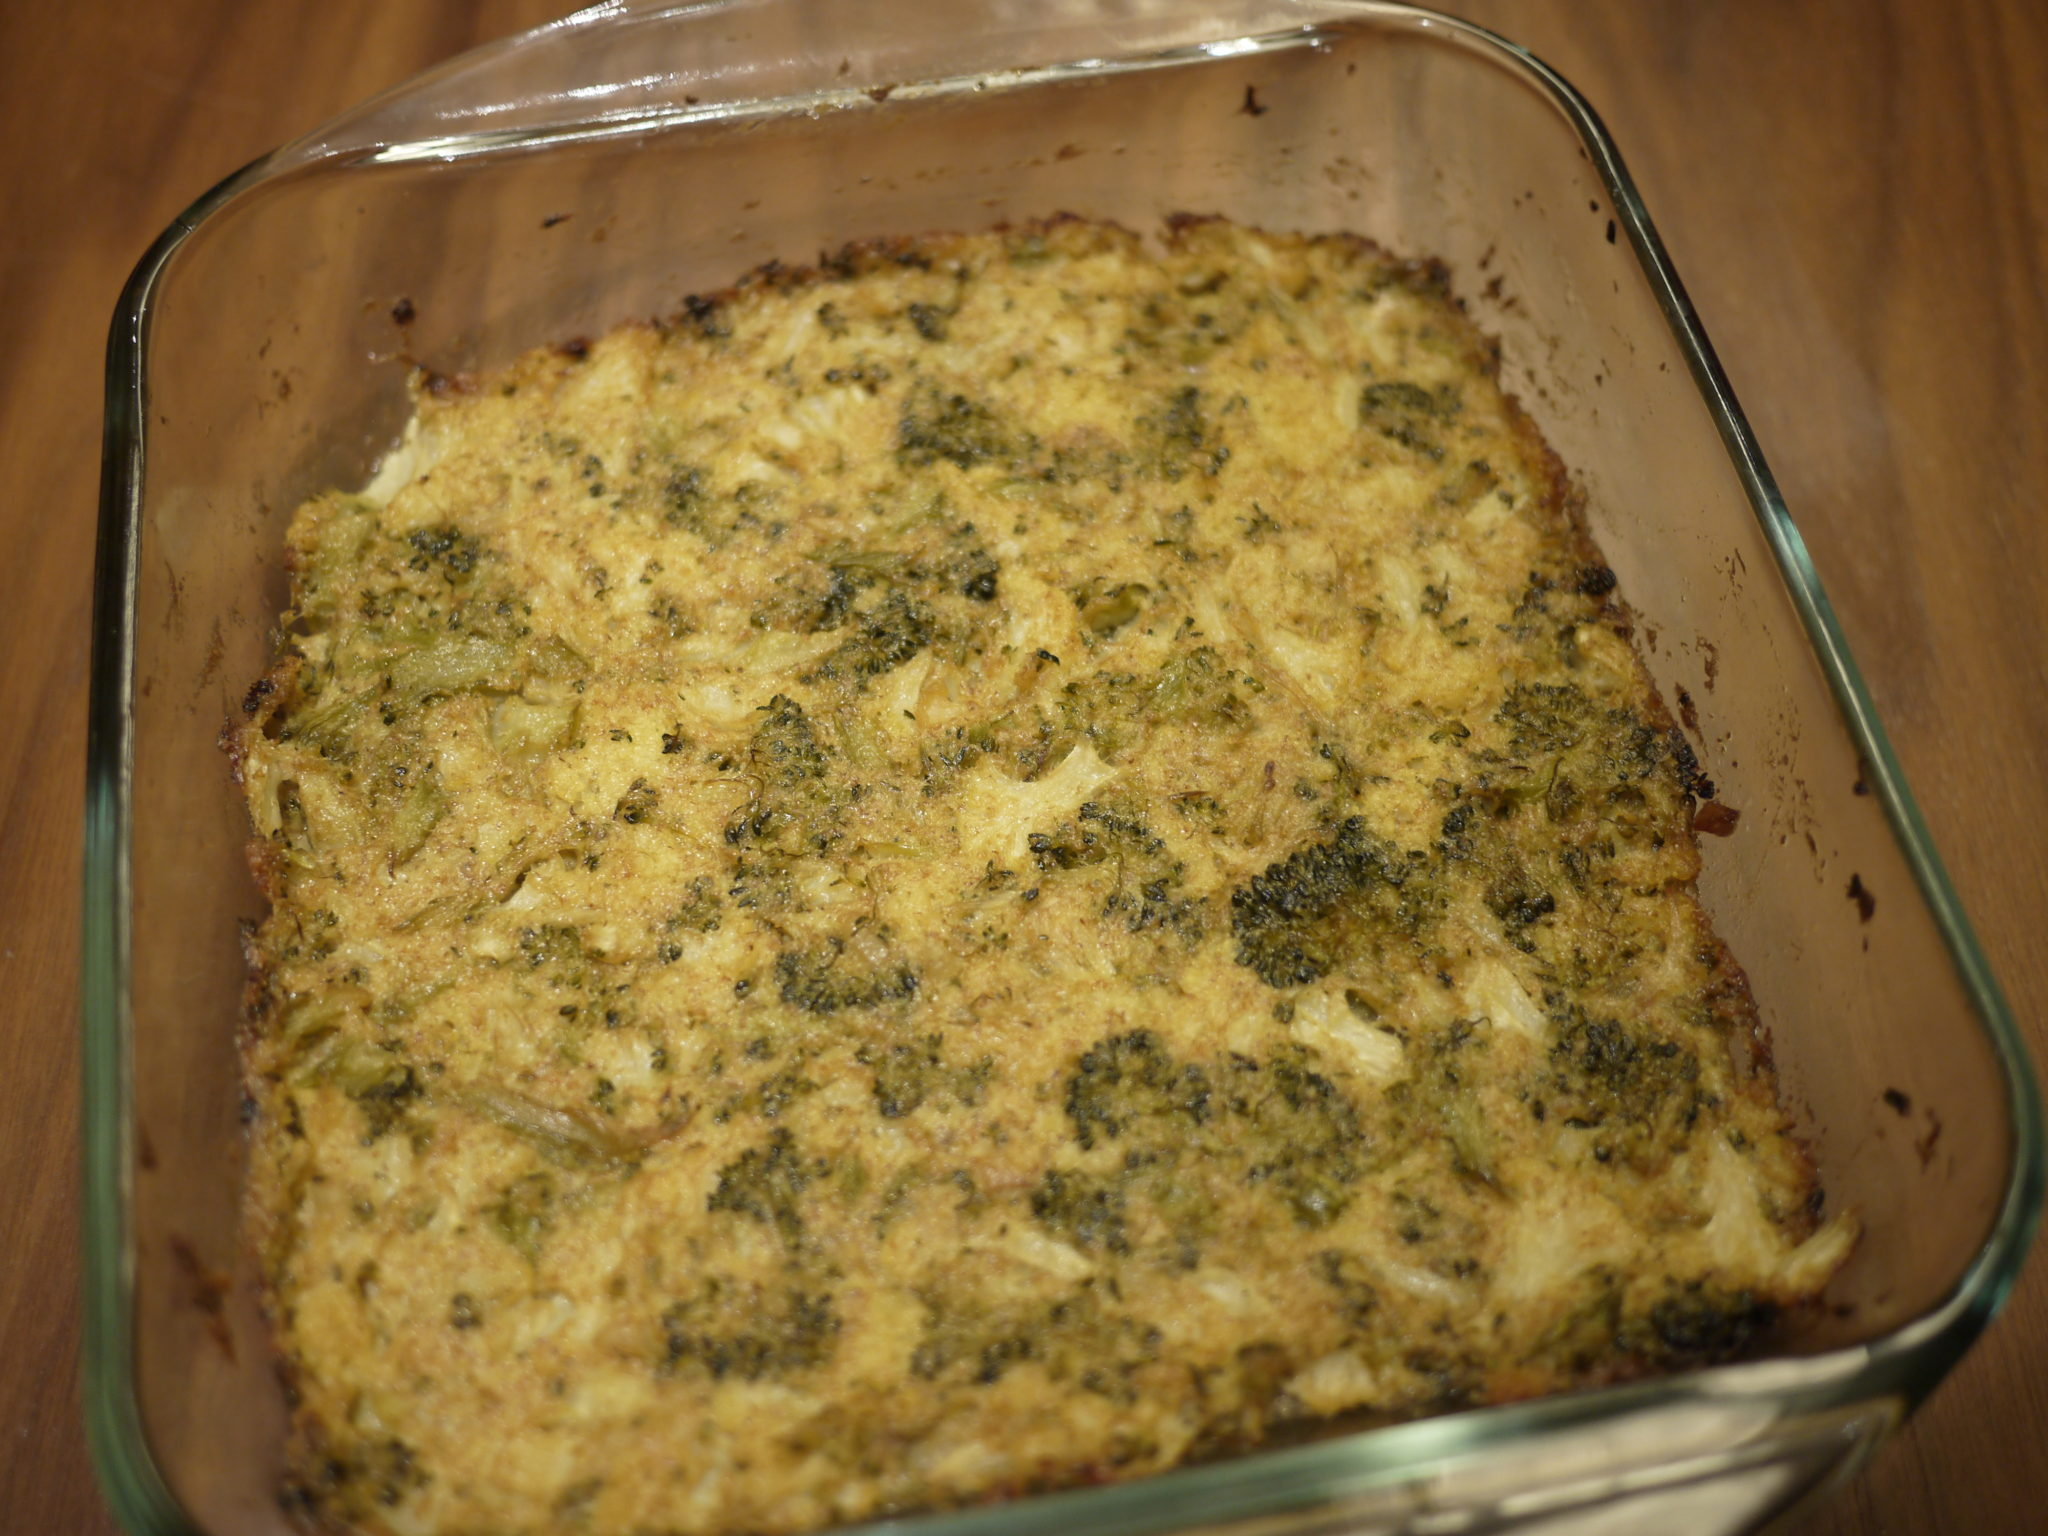 Cauliflower broccoli dairy-free casserole